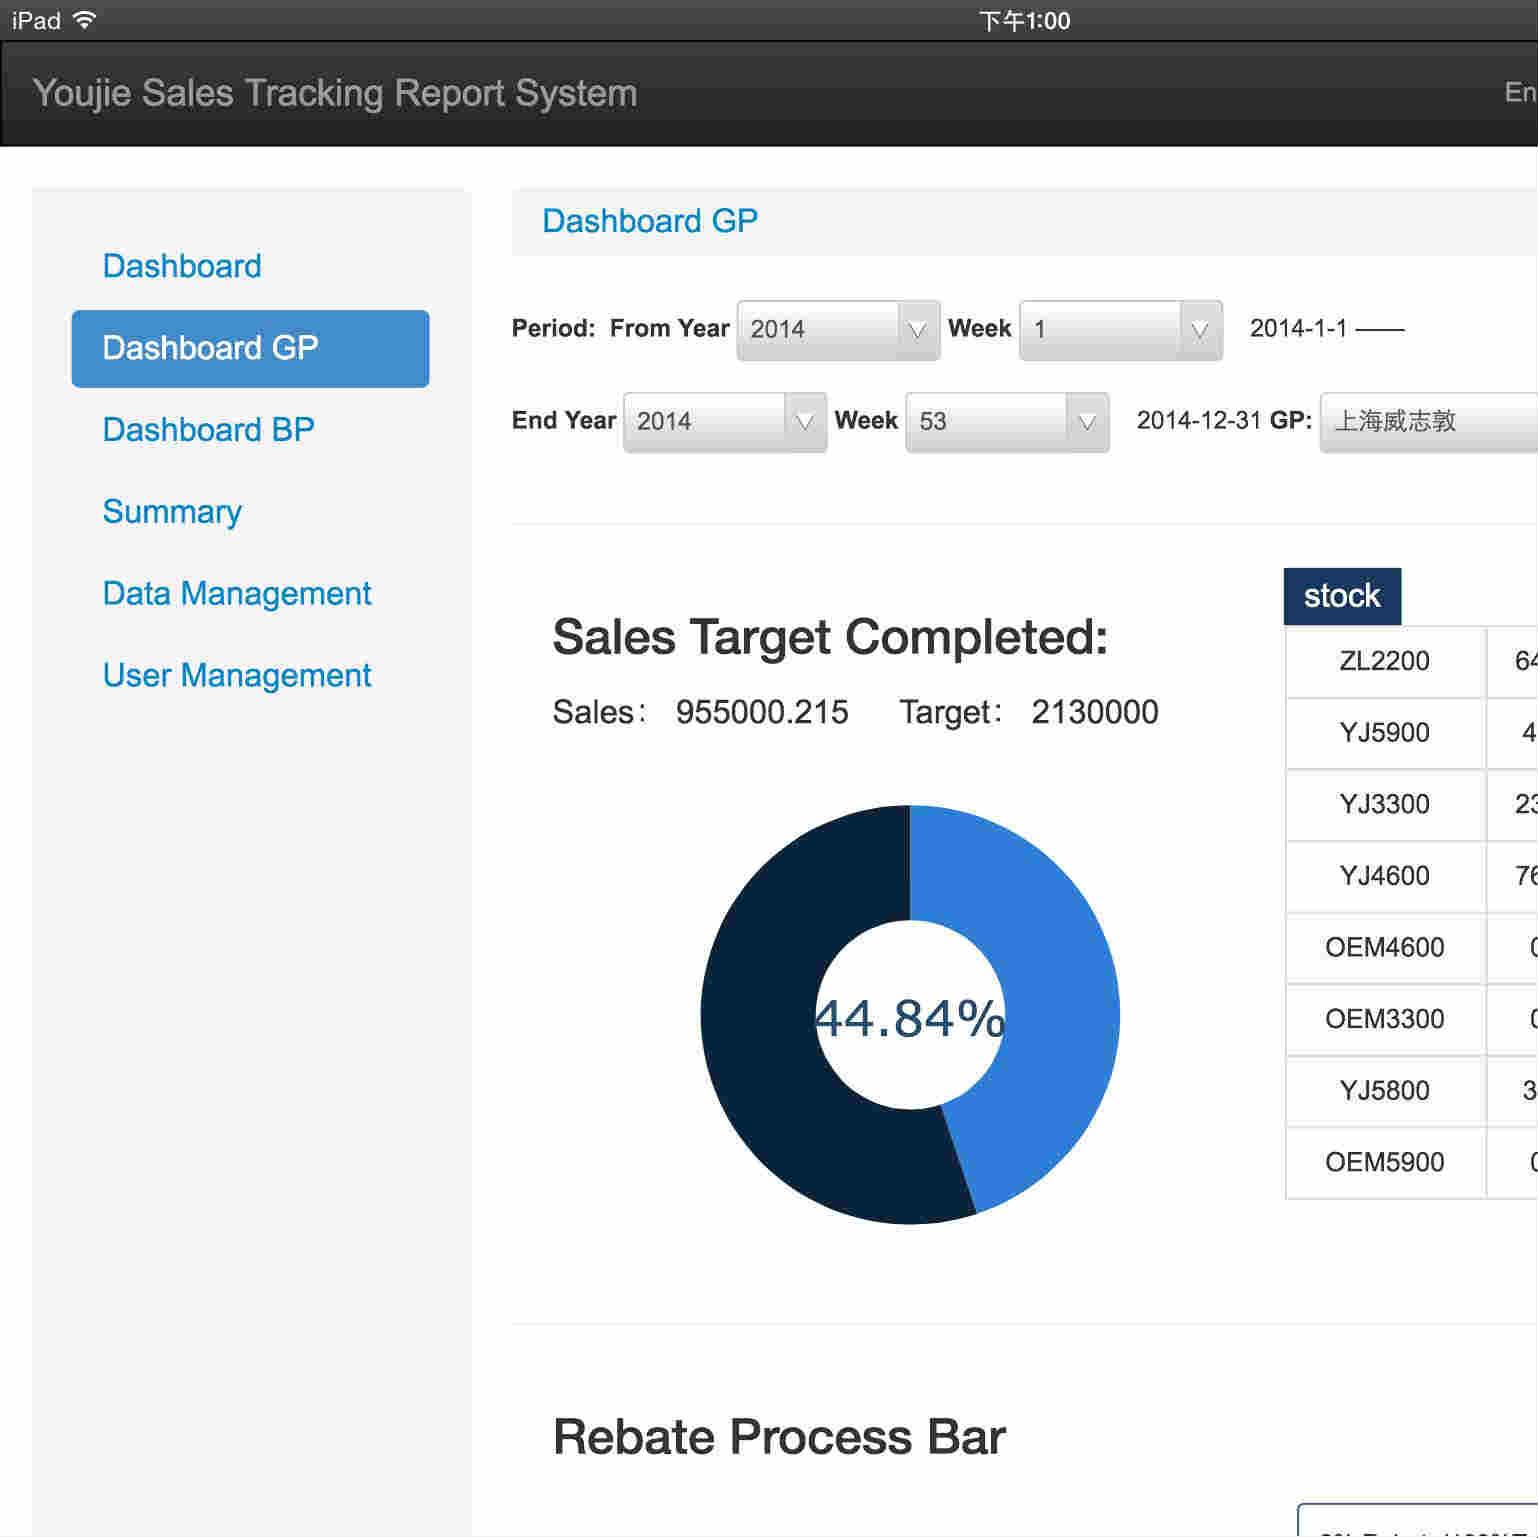 Honeywell大中华区域销售管理跟踪管理报表系统